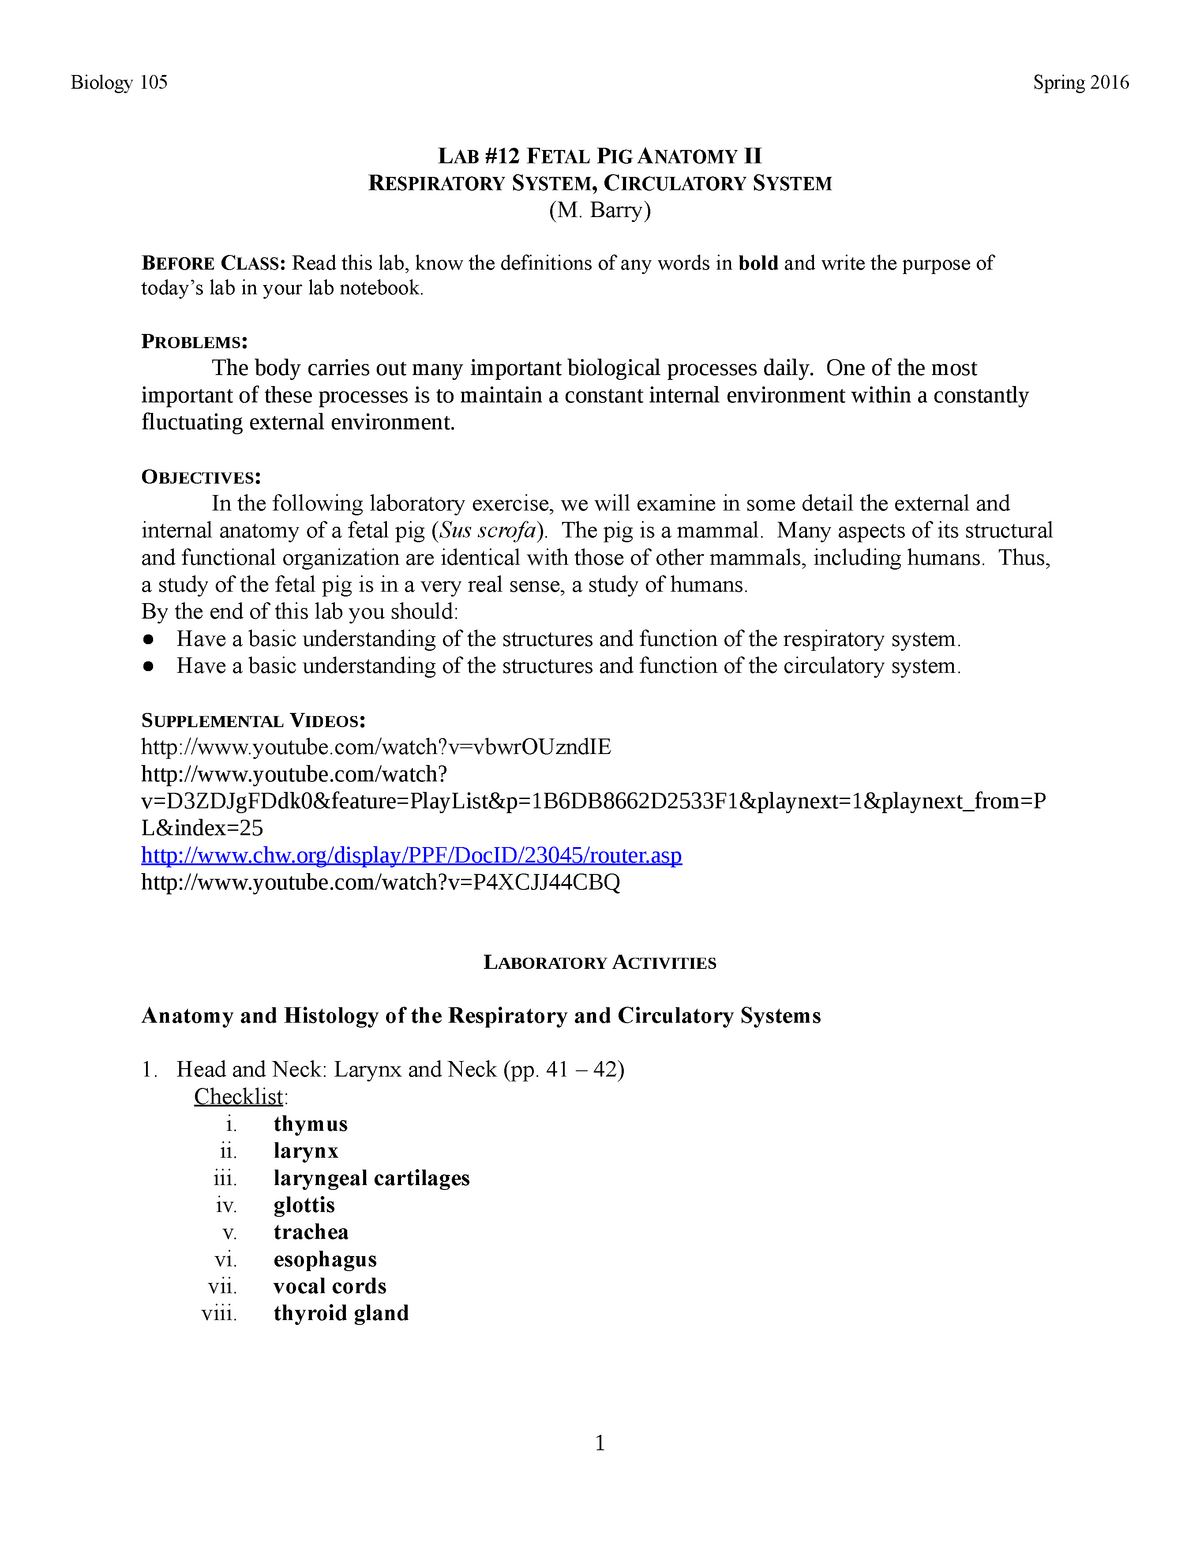 12 fetal pig II - notes - BIOL 105: General Biology